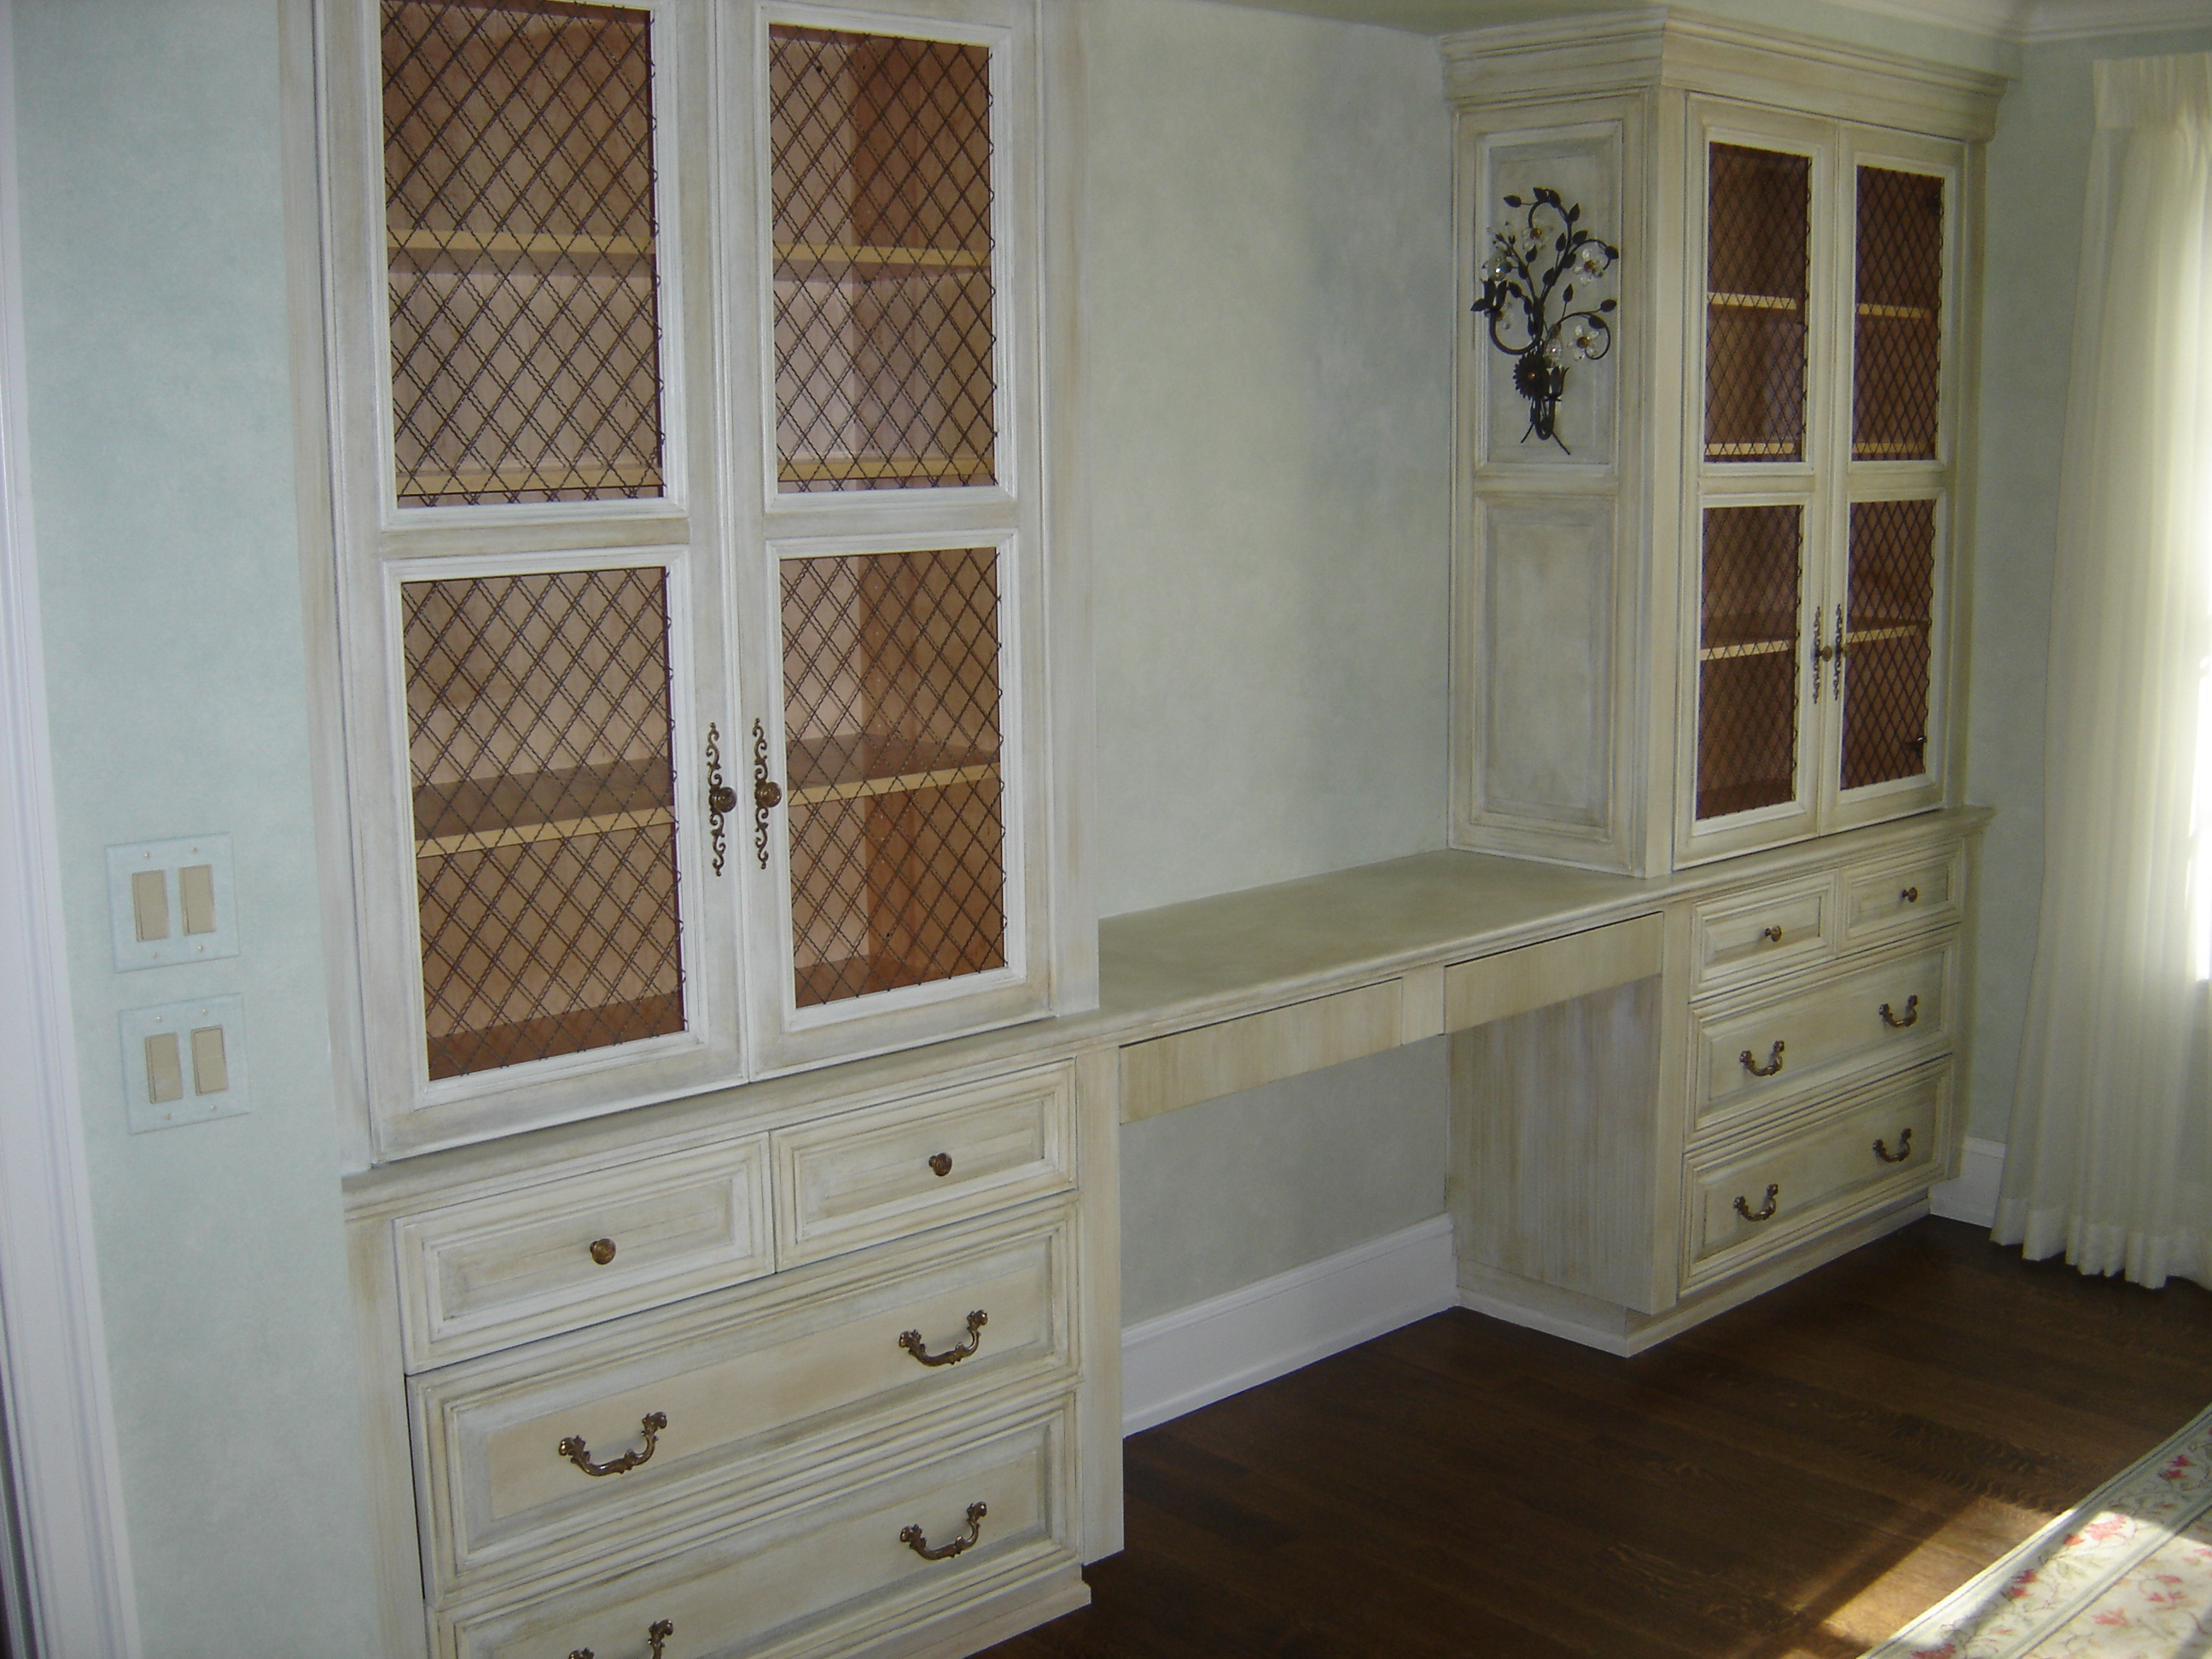 Built-in Bedroom Vanity W/ Custom Antique Painted Finish